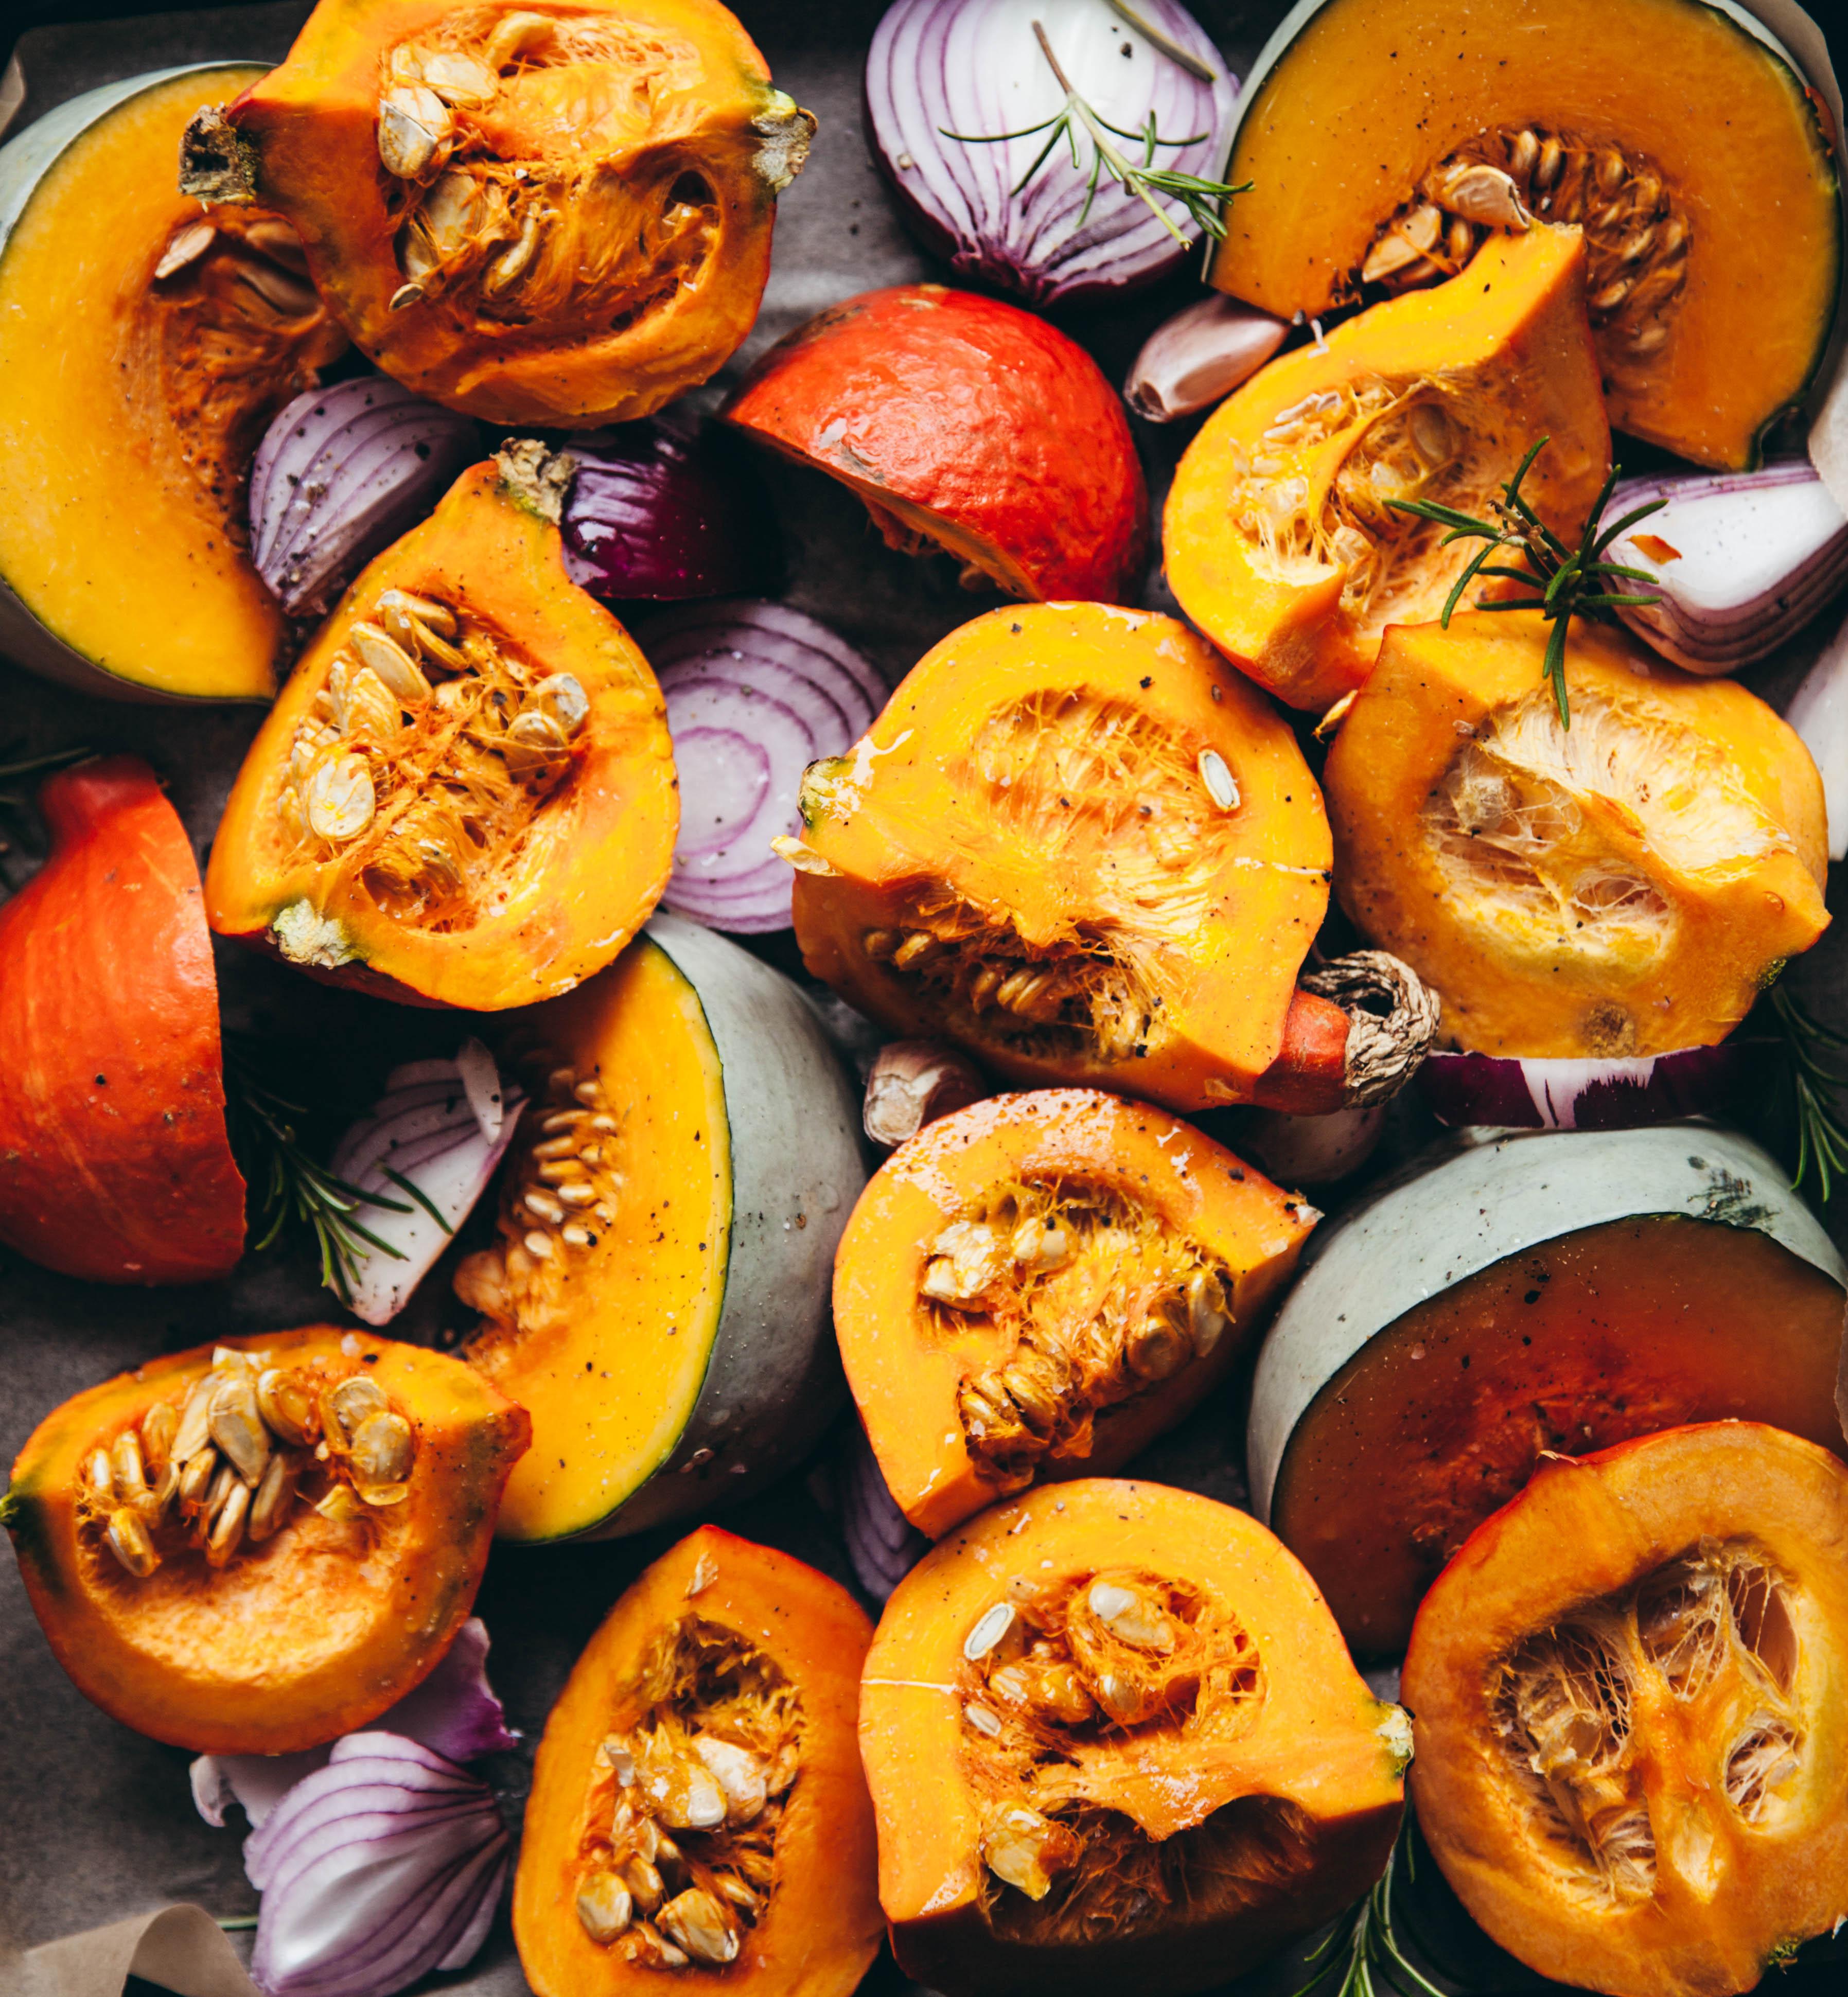 Pumpkin roasting